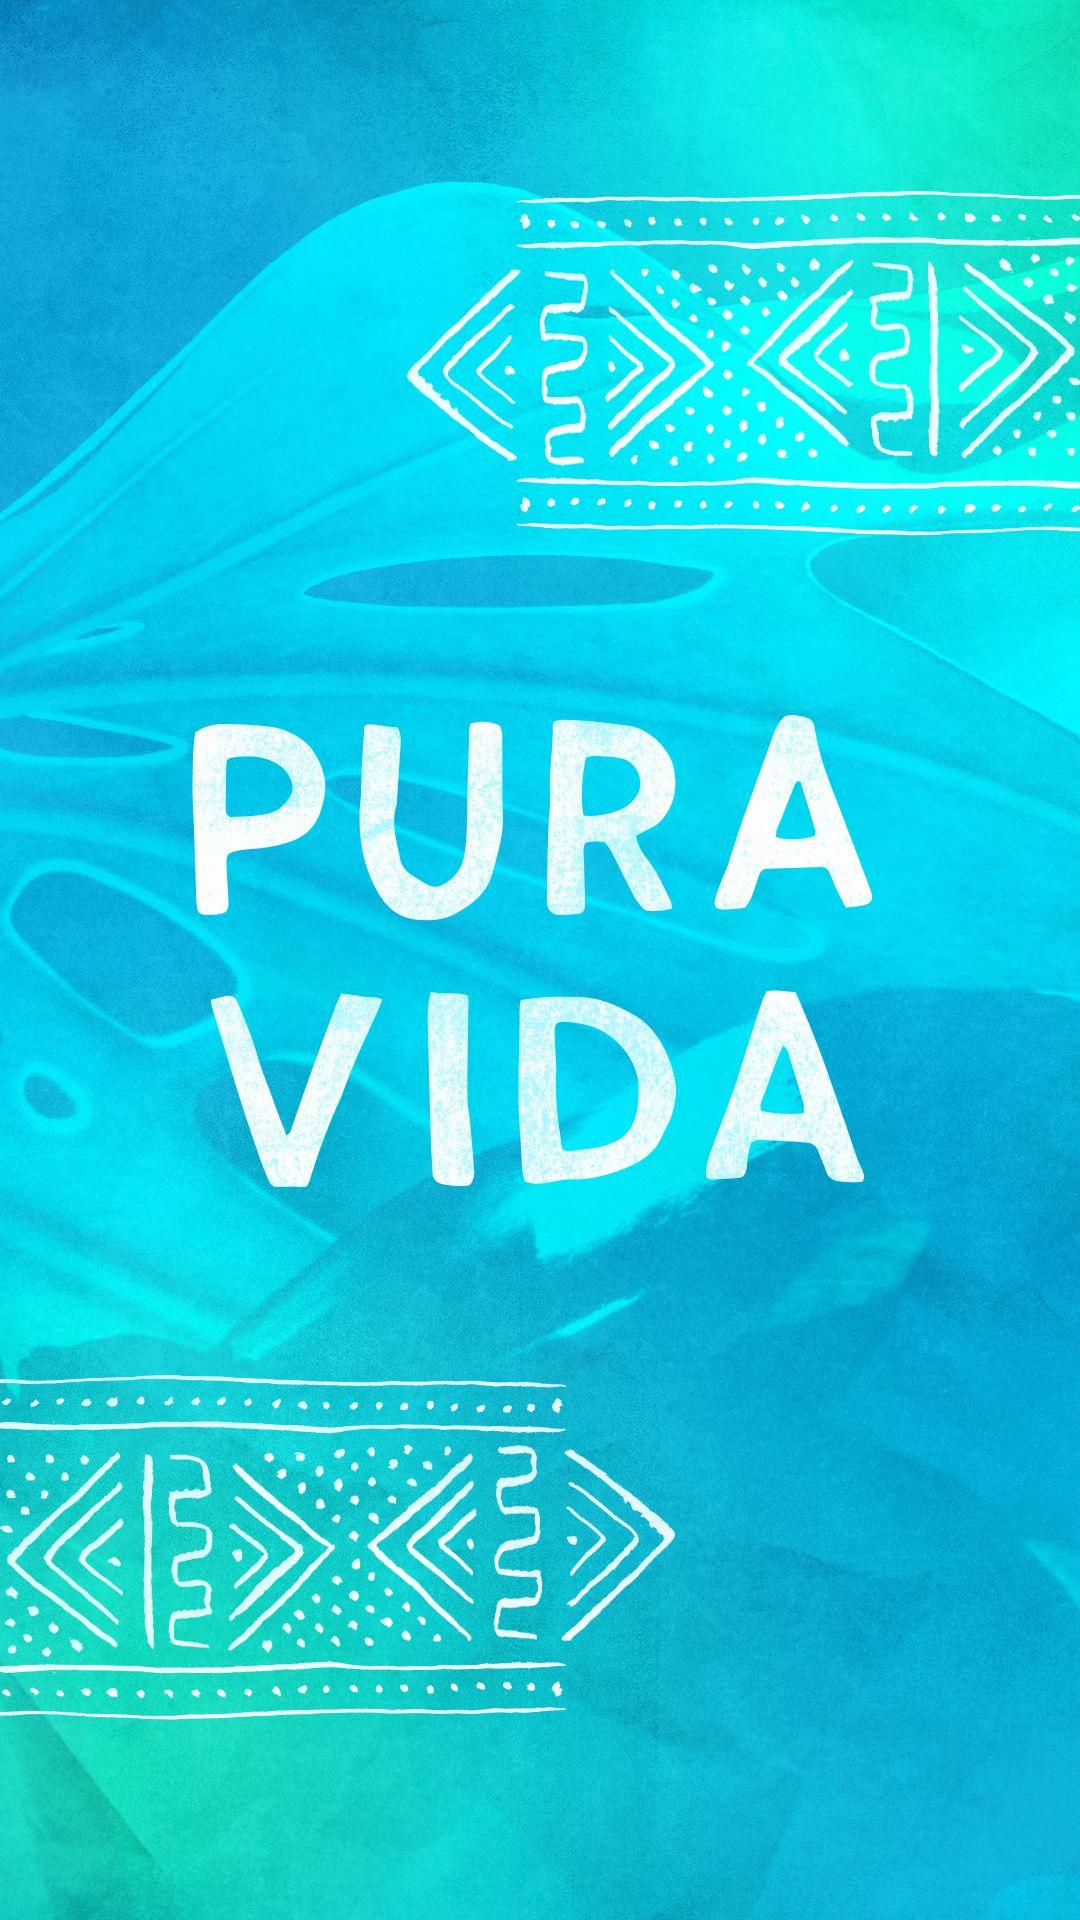 pura vida wallpaper  The Pura Vida Bracelets Blog - Under the Palms Digi Downloads ...